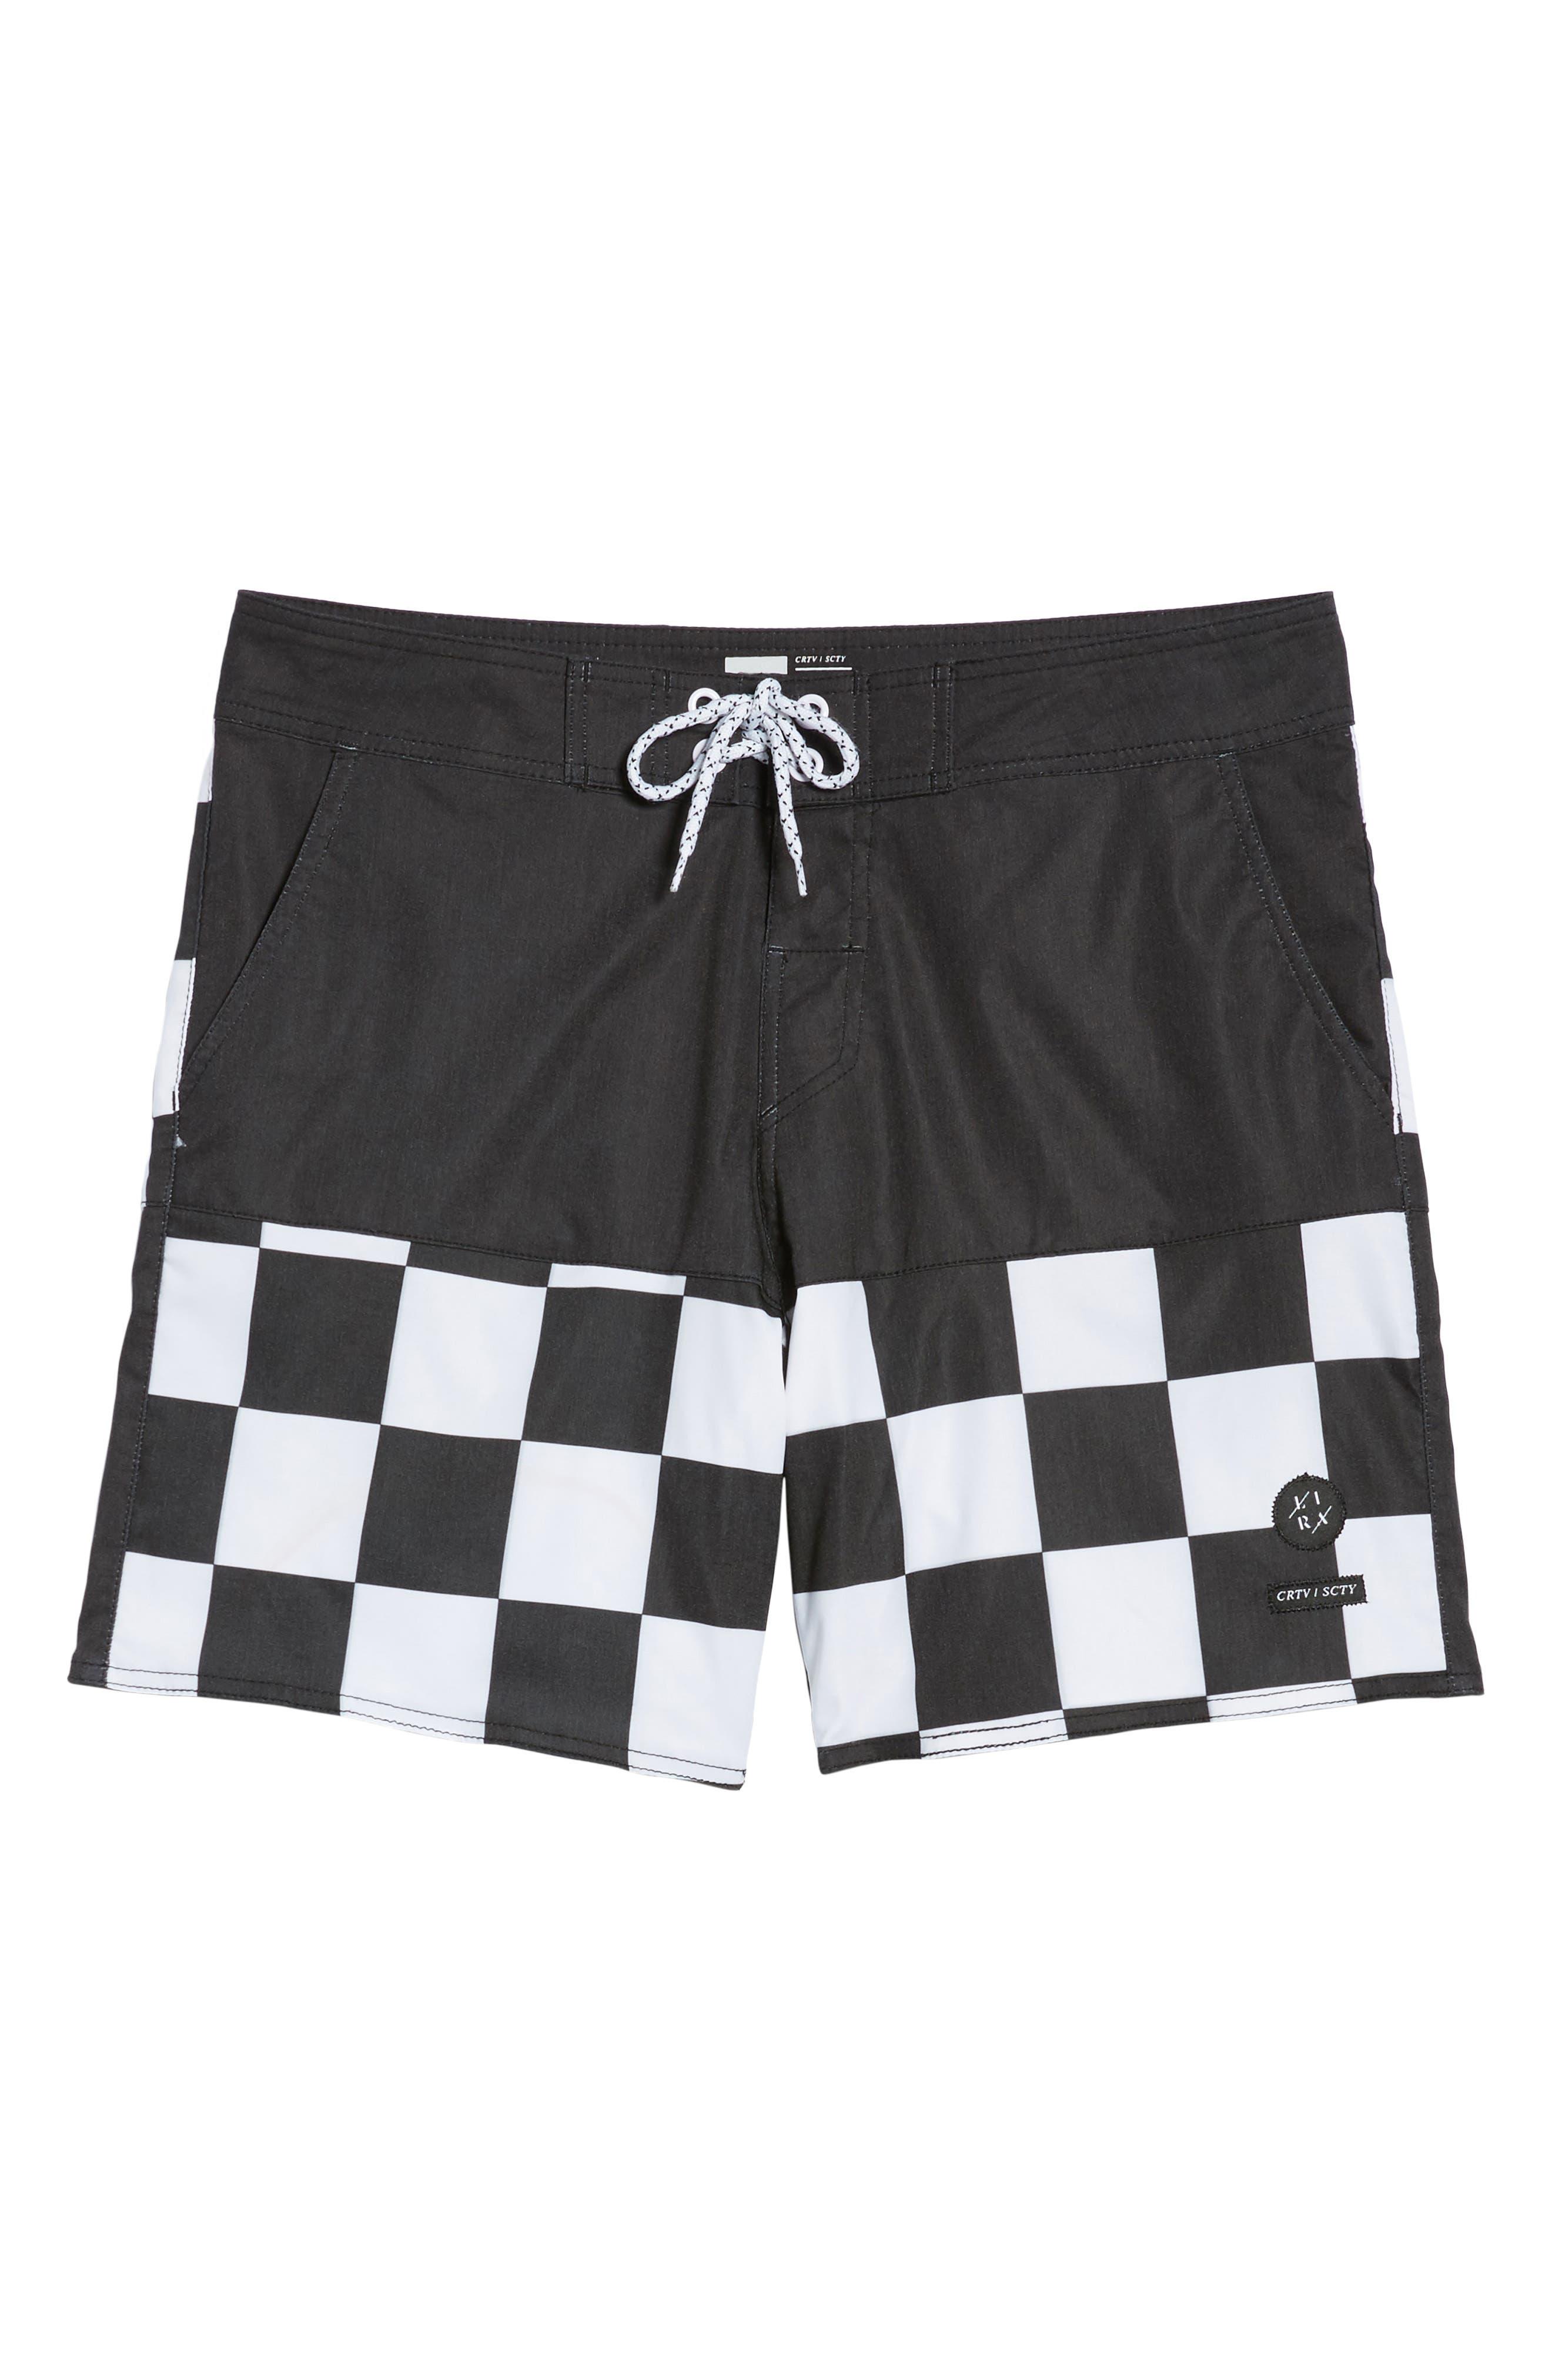 Checkered Board Shorts,                             Alternate thumbnail 6, color,                             001